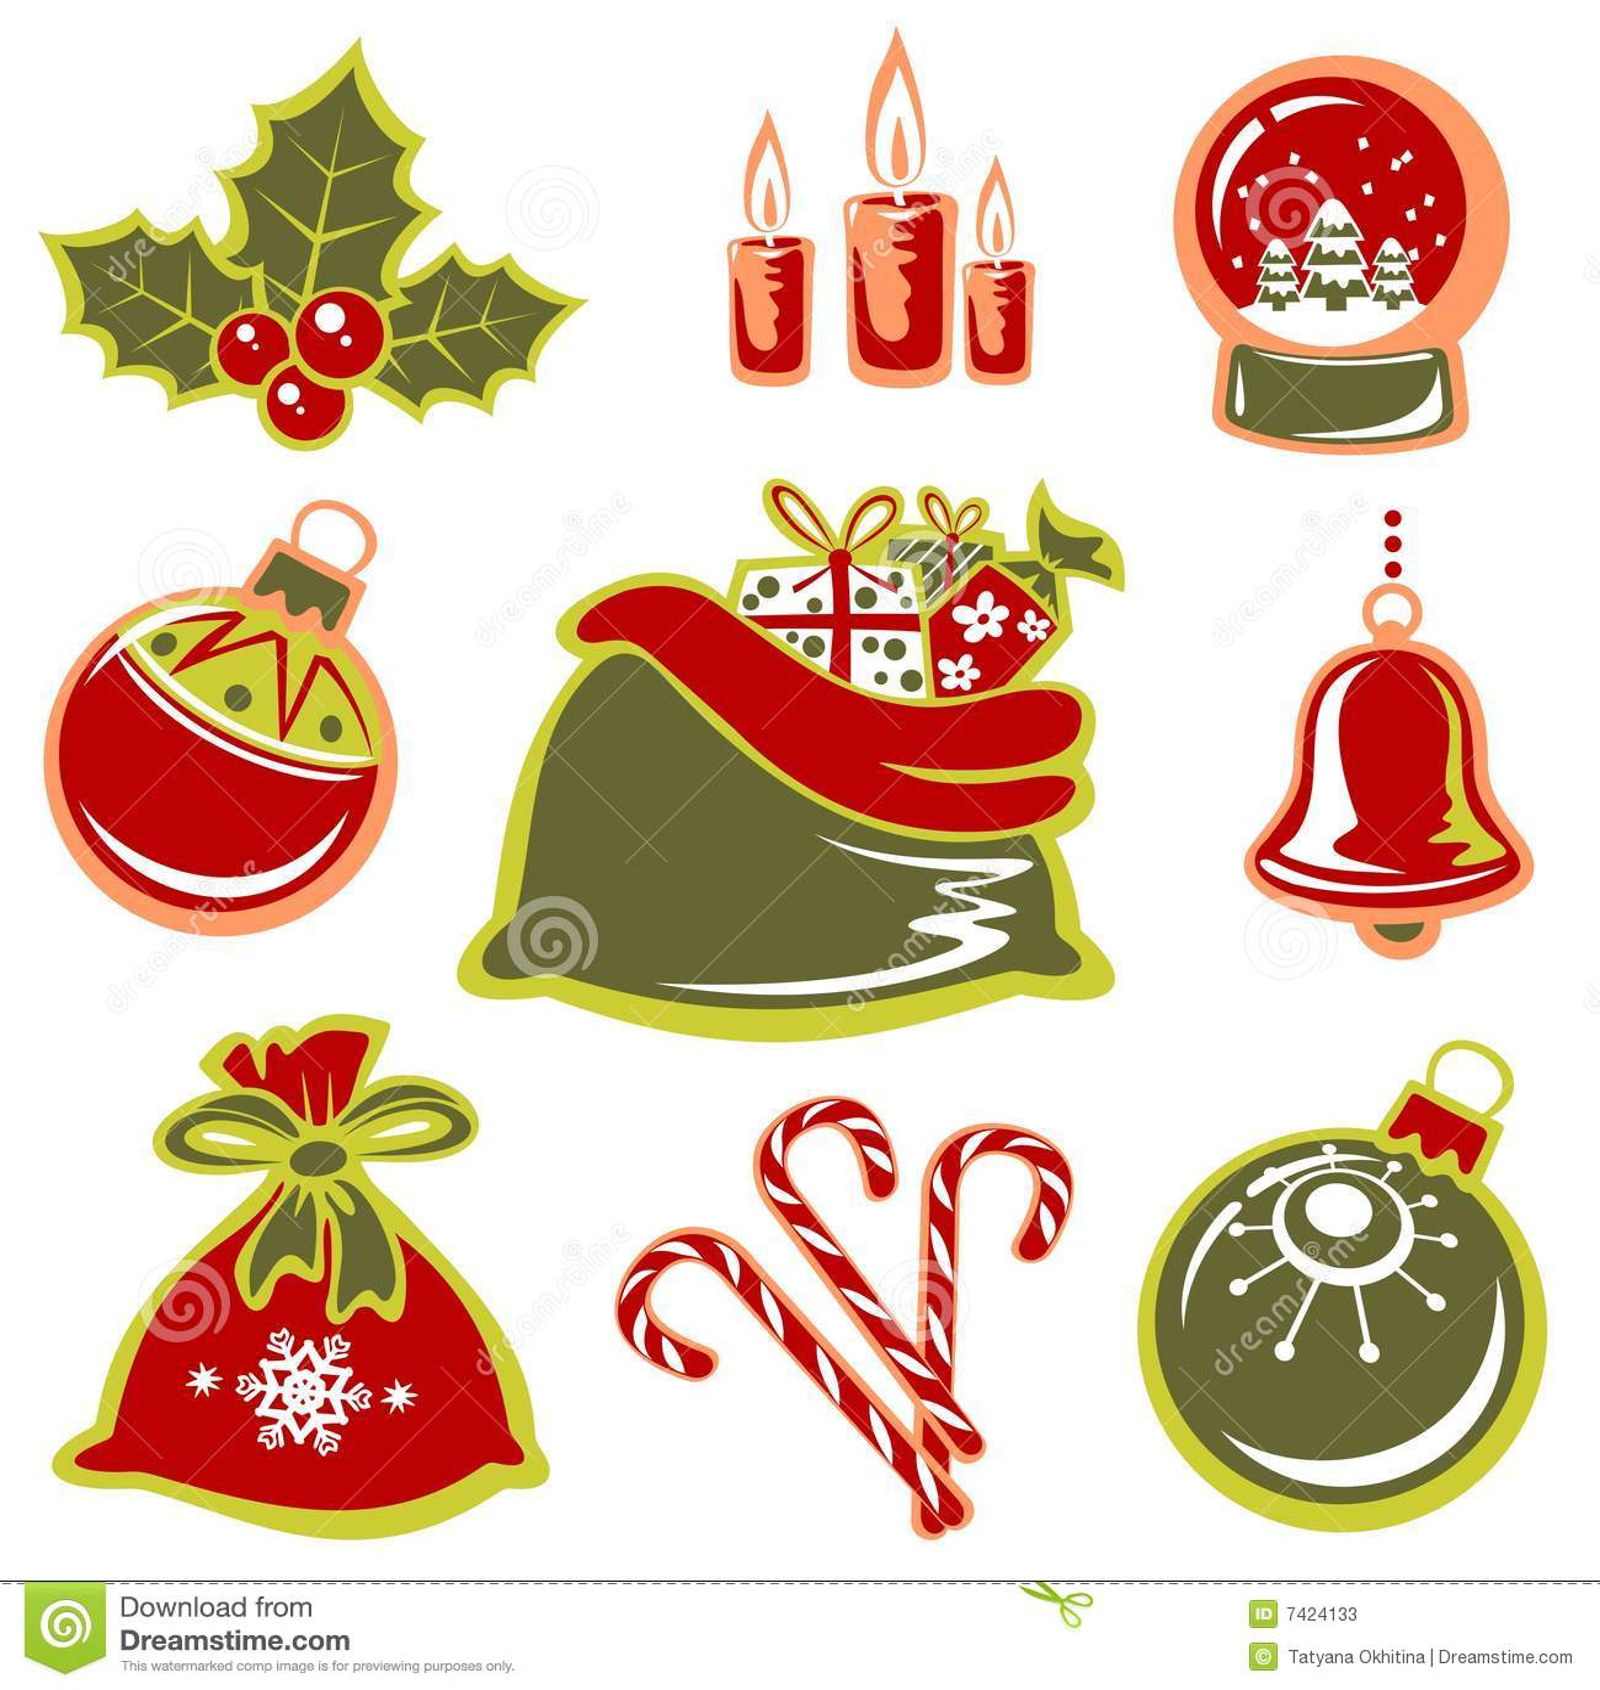 How To Read Floor Plans Symbols Christmas Symbols Set Stock Photos Image 7424133